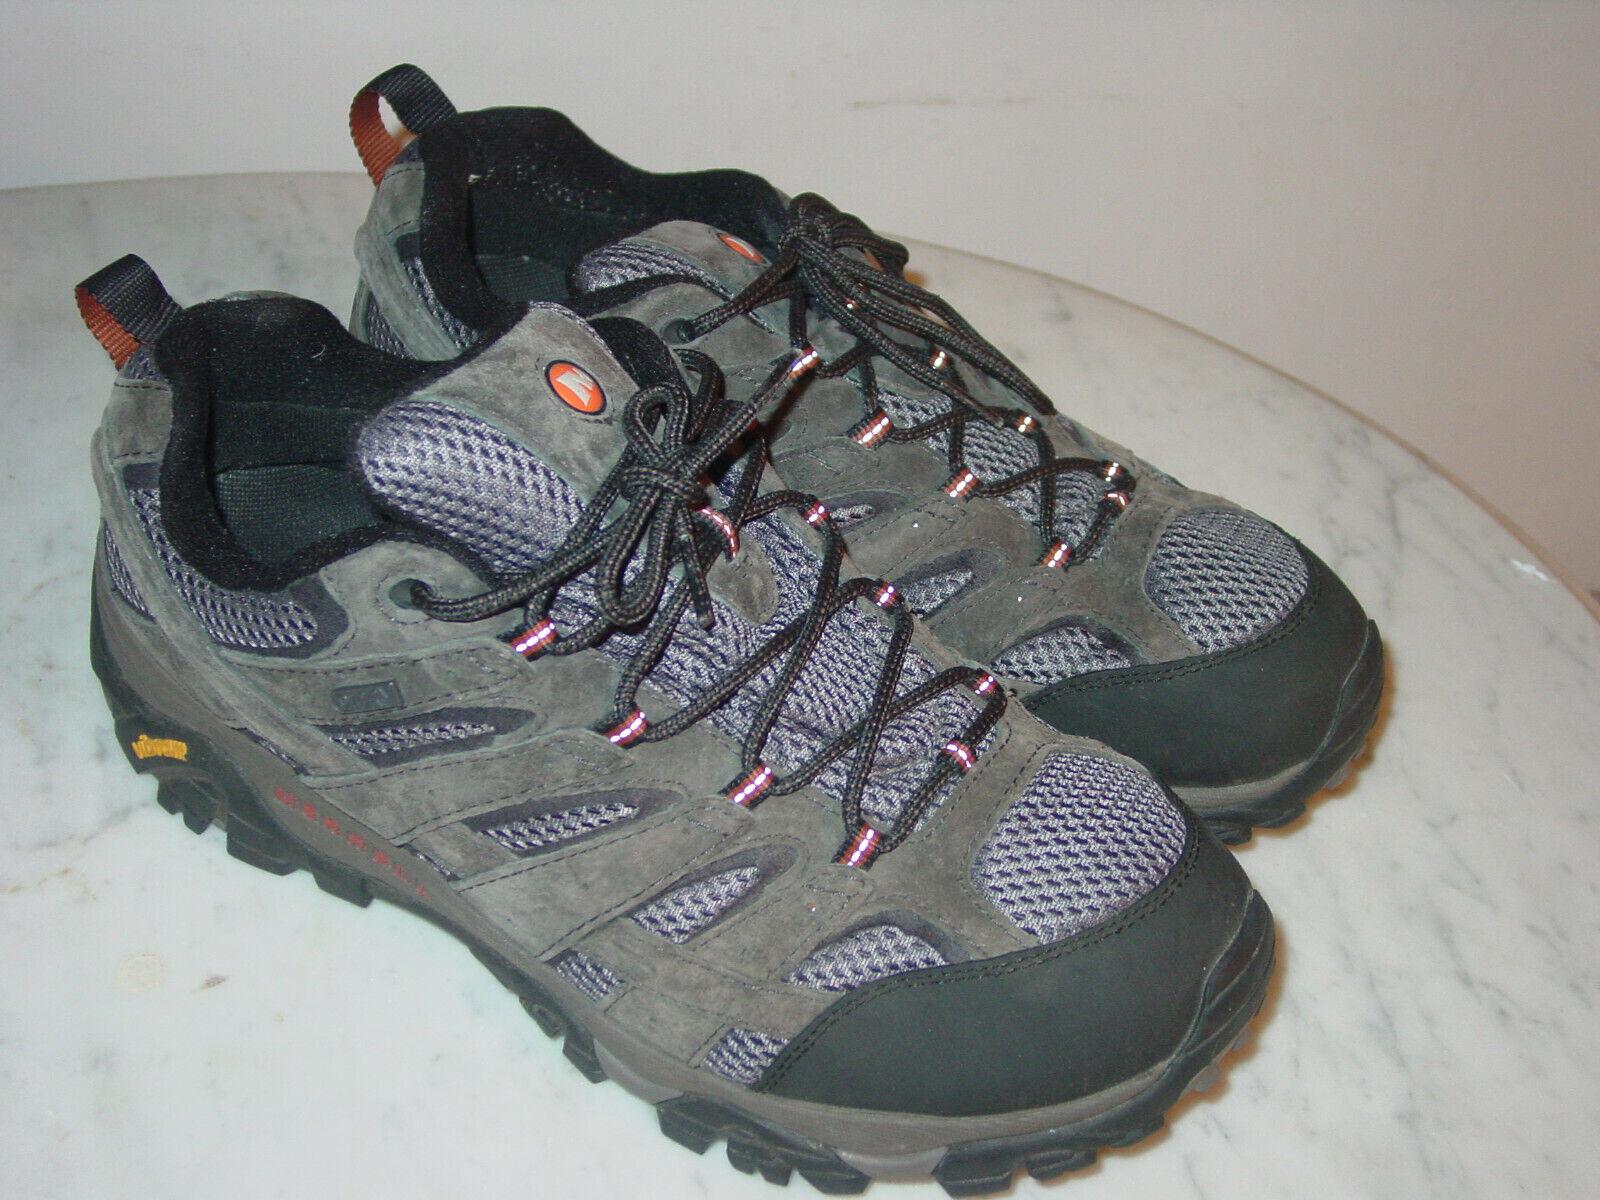 Para Hombre Merrell Moab 2 Impermeable J06029W Beluga Trail senderismo zapatos  (ancho)